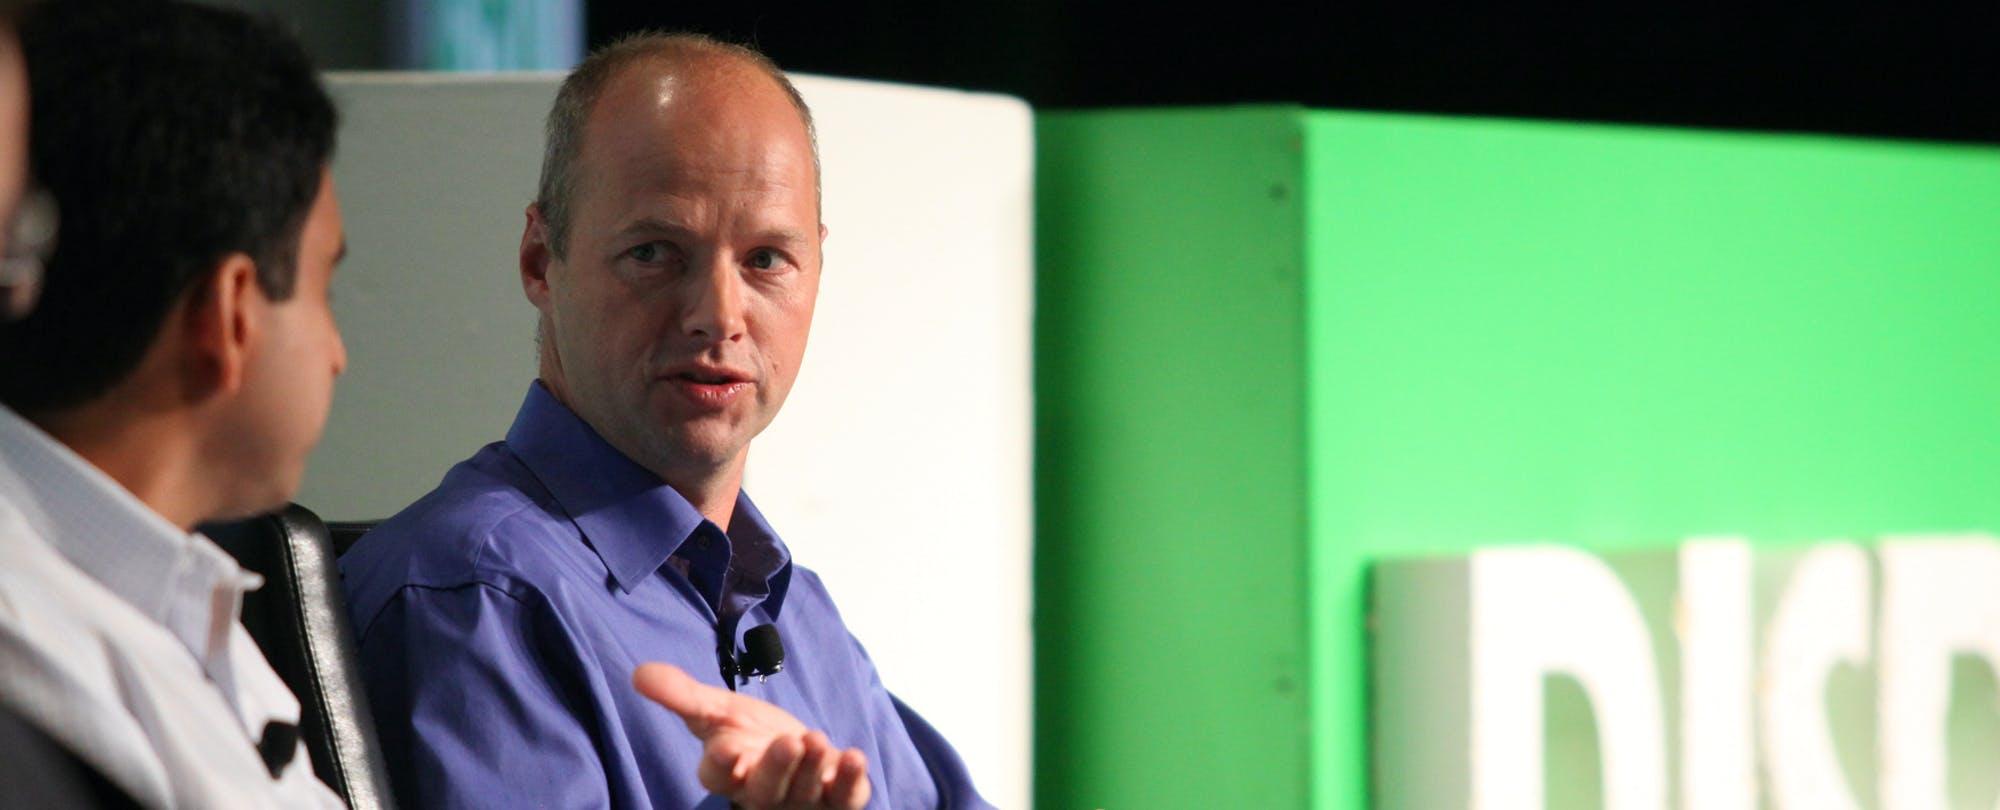 Udacity Raises Fresh $35M to Expand the 'University of Silicon Valley'